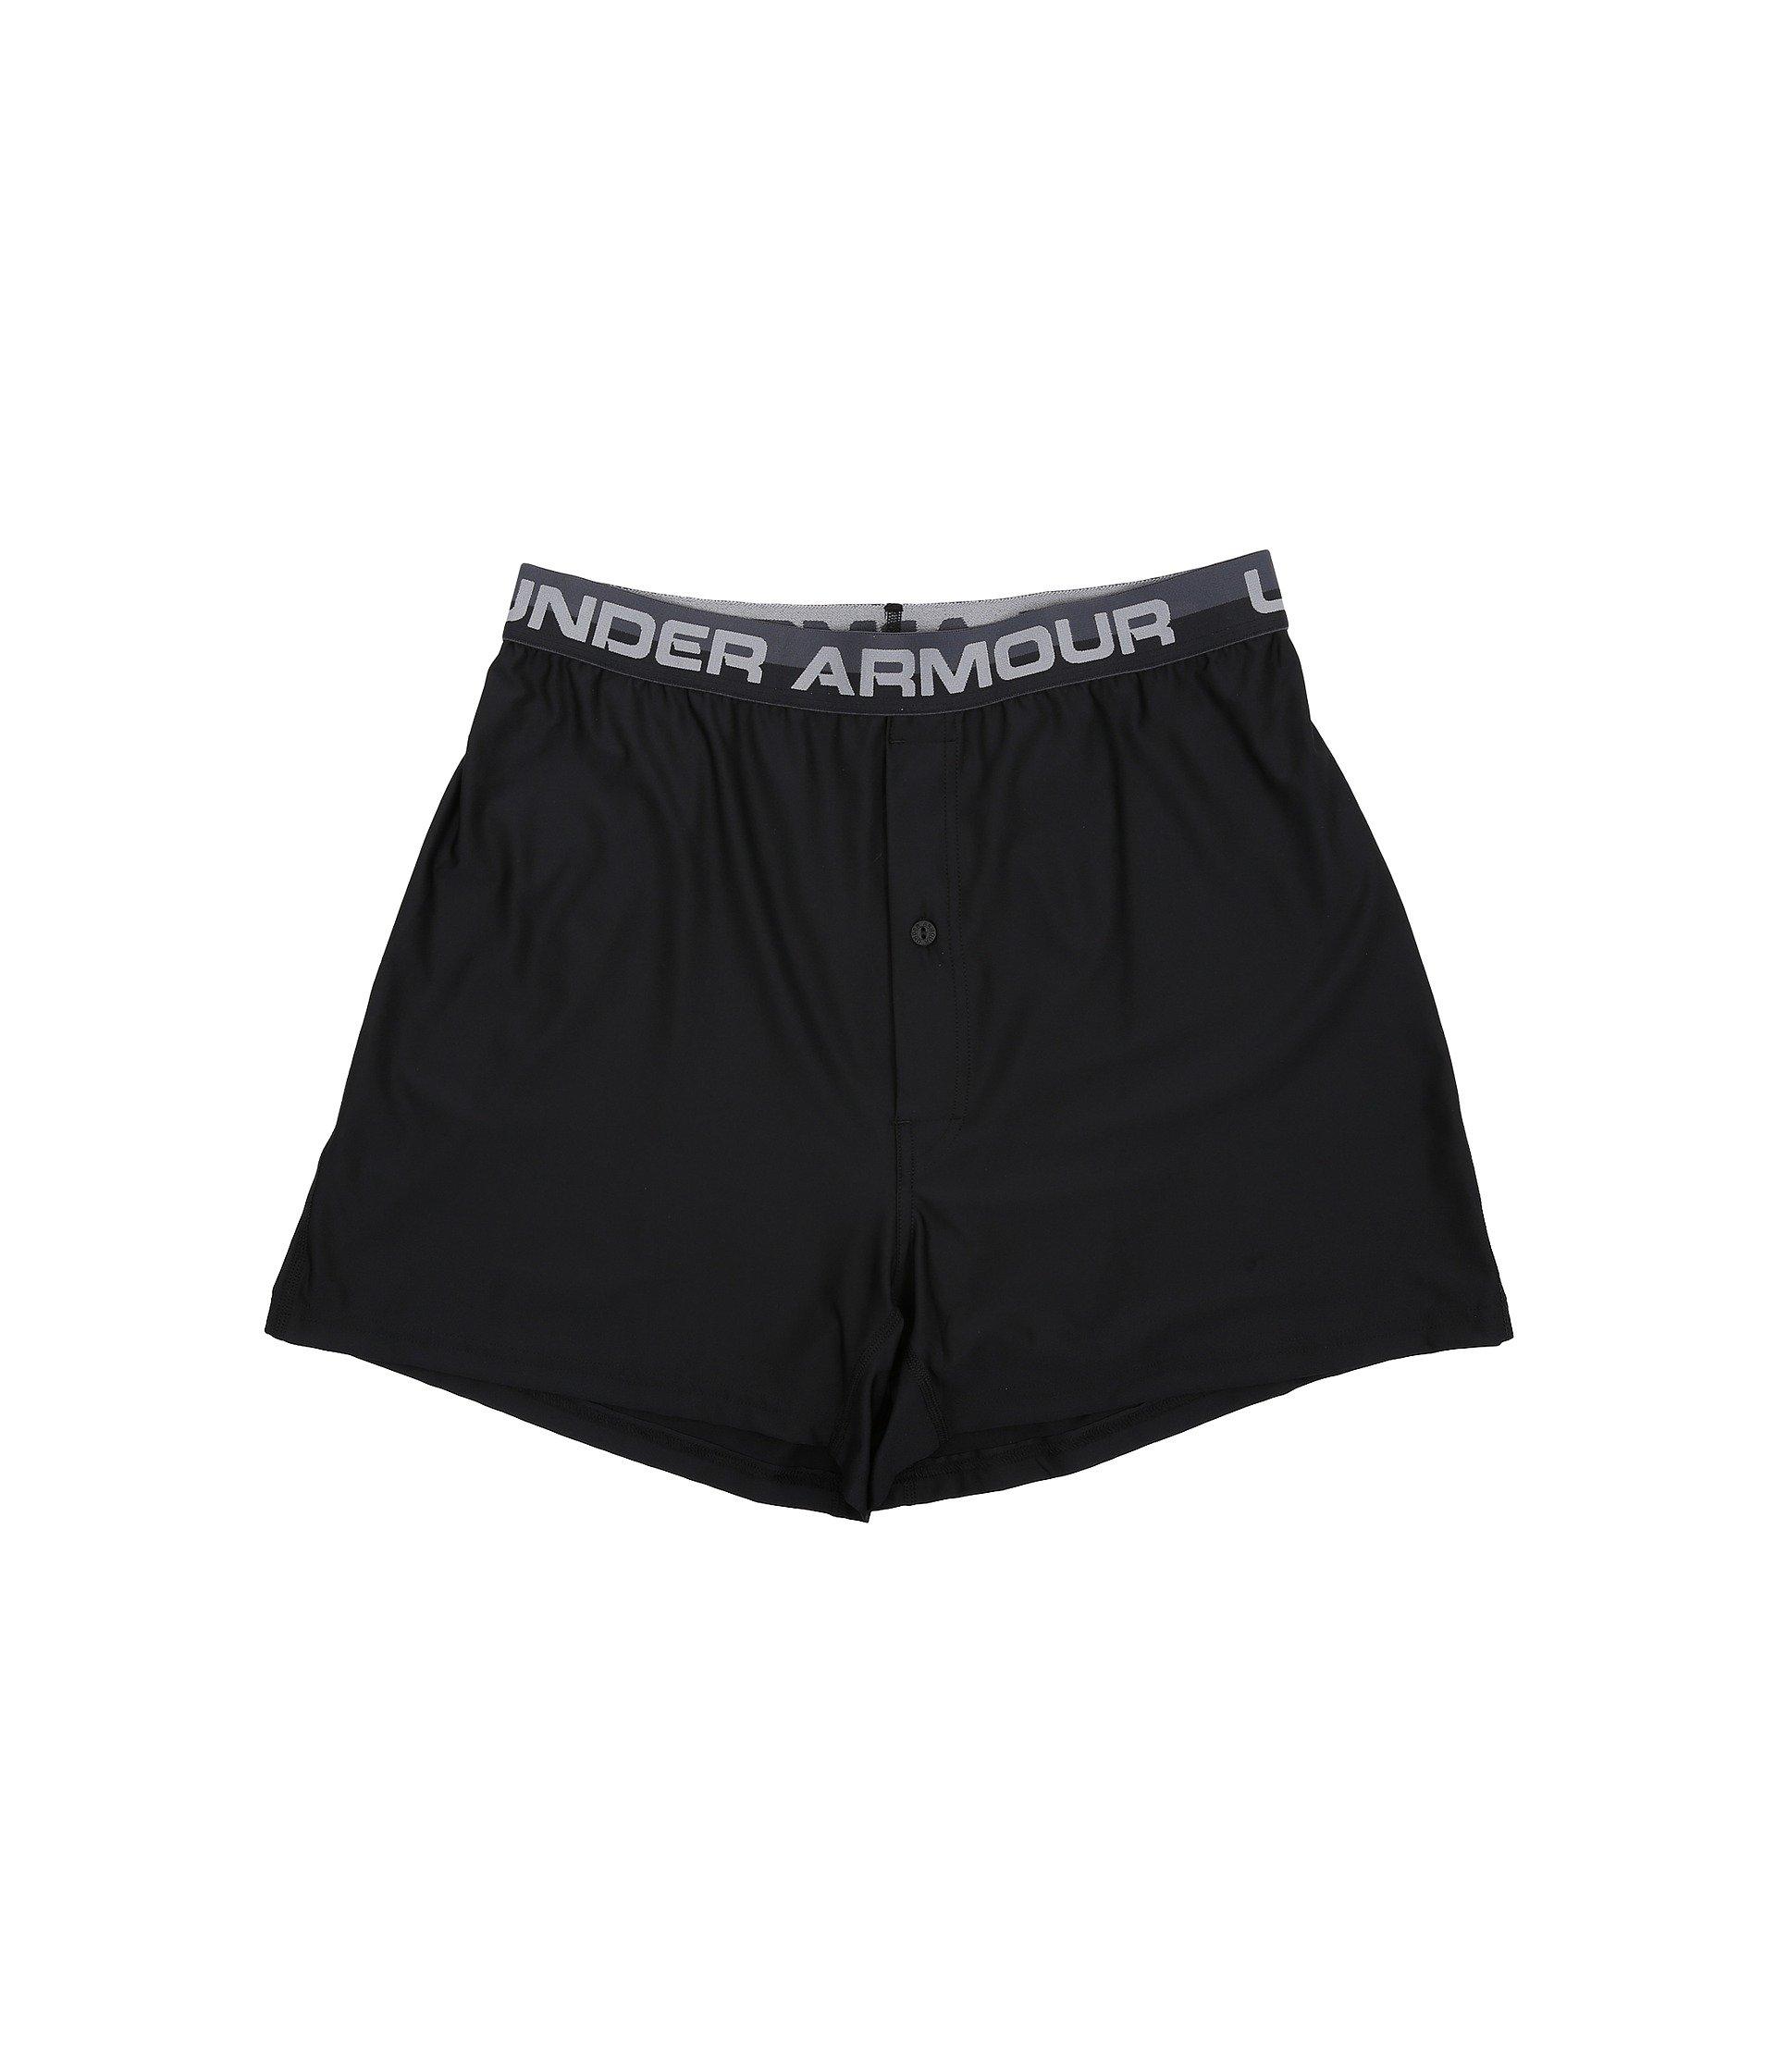 Ropa Interior para Hombre Under Armour UA Original Series Boxer Shorts  + Under Armour en VeoyCompro.net